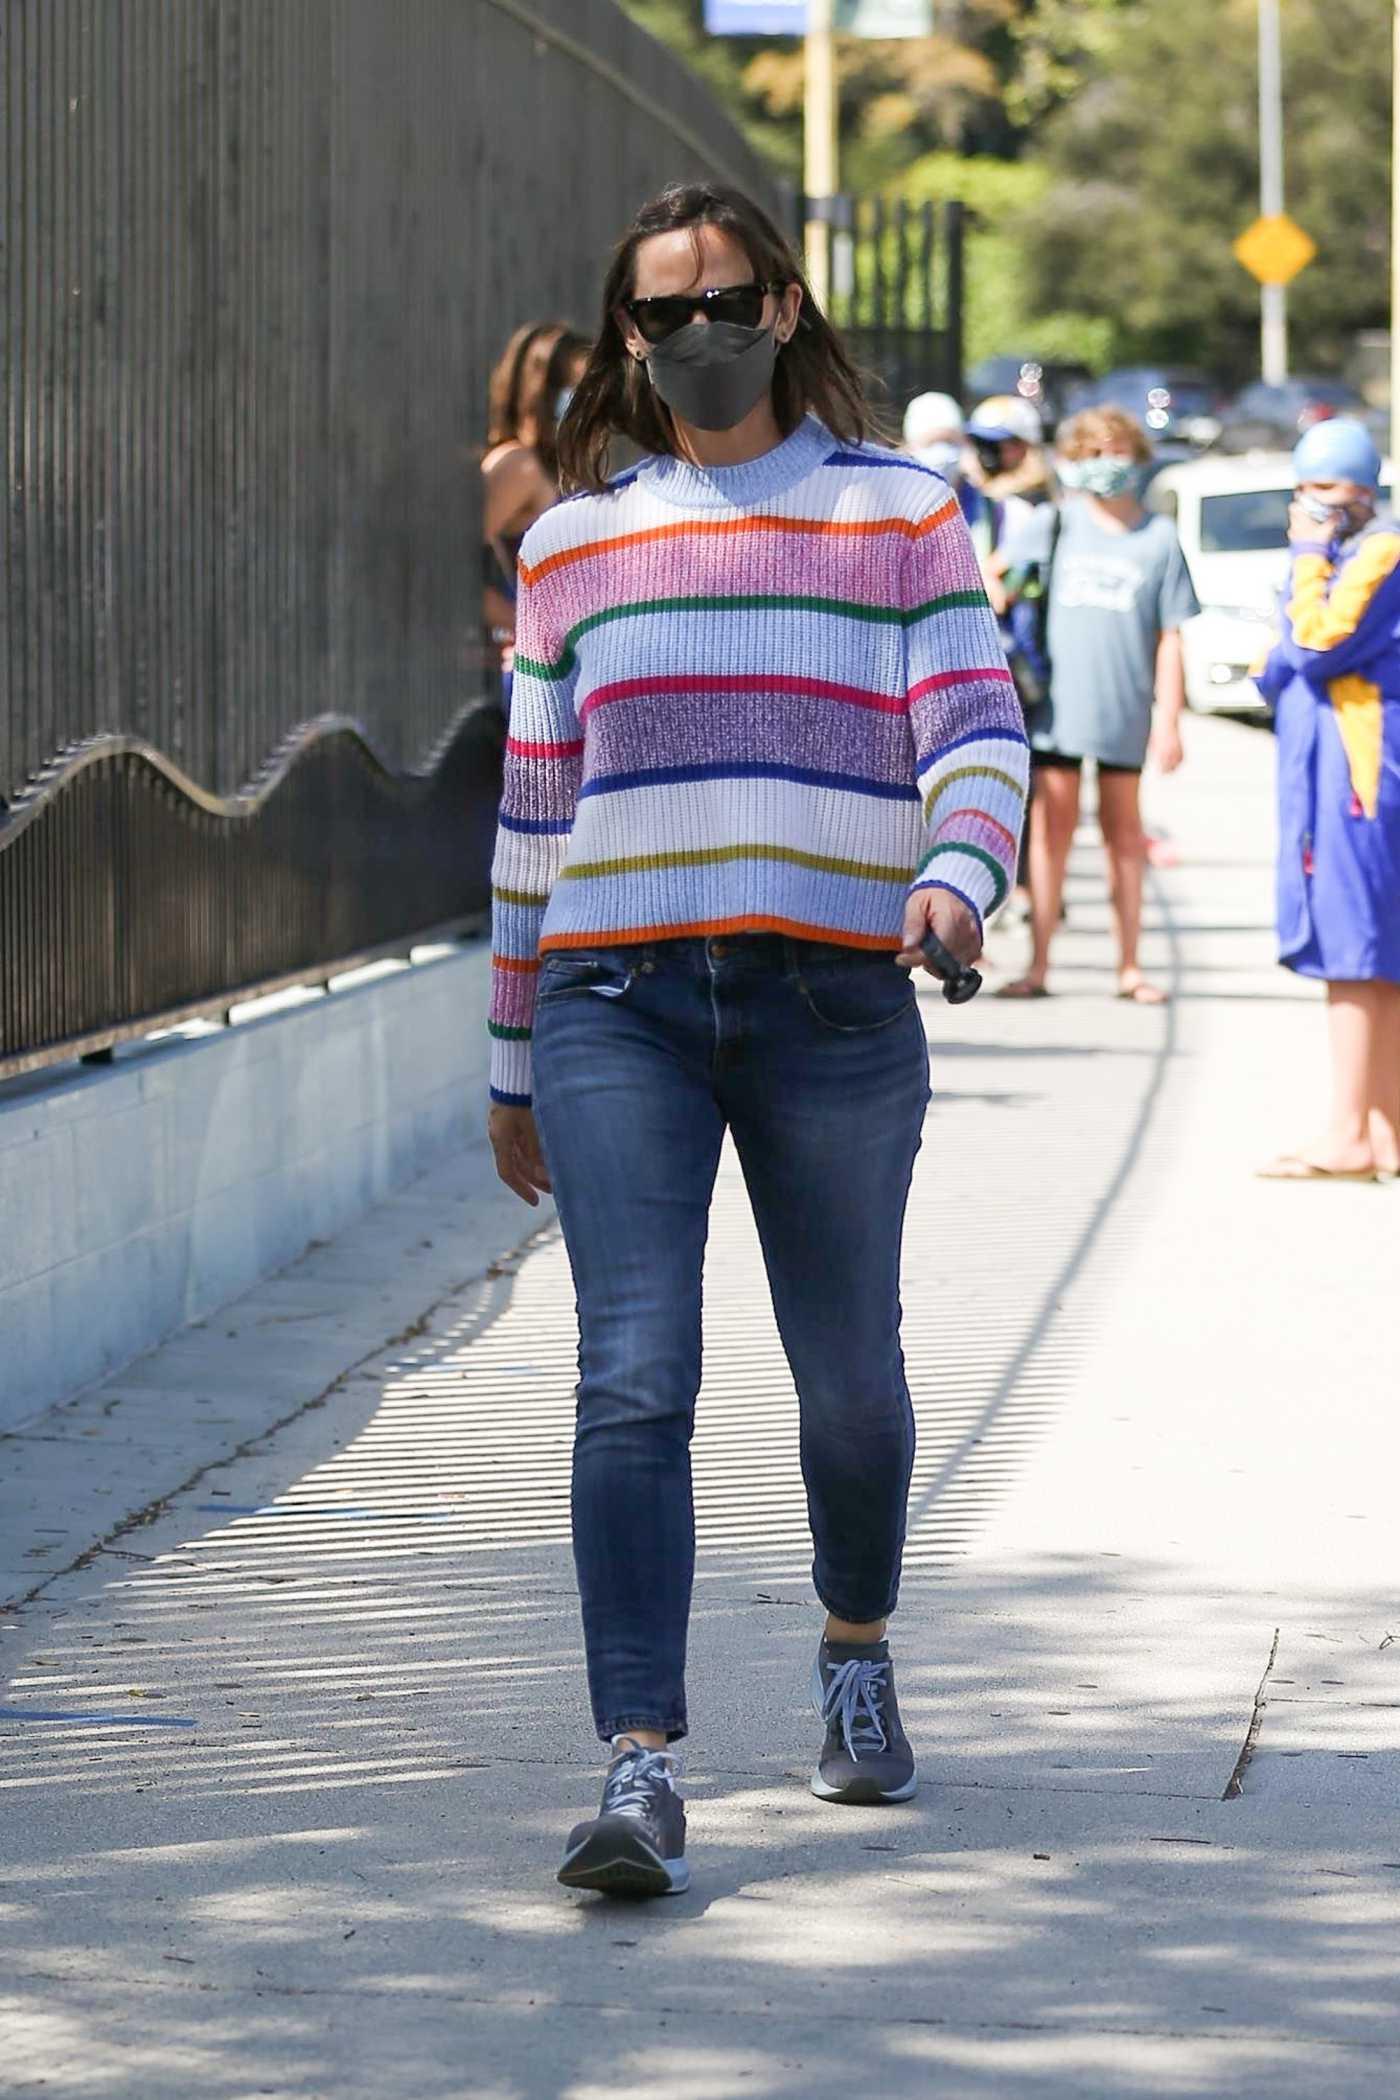 Jennifer Garner in a Striped Sweater Was Seen Out in Brentwood 05/28/2021